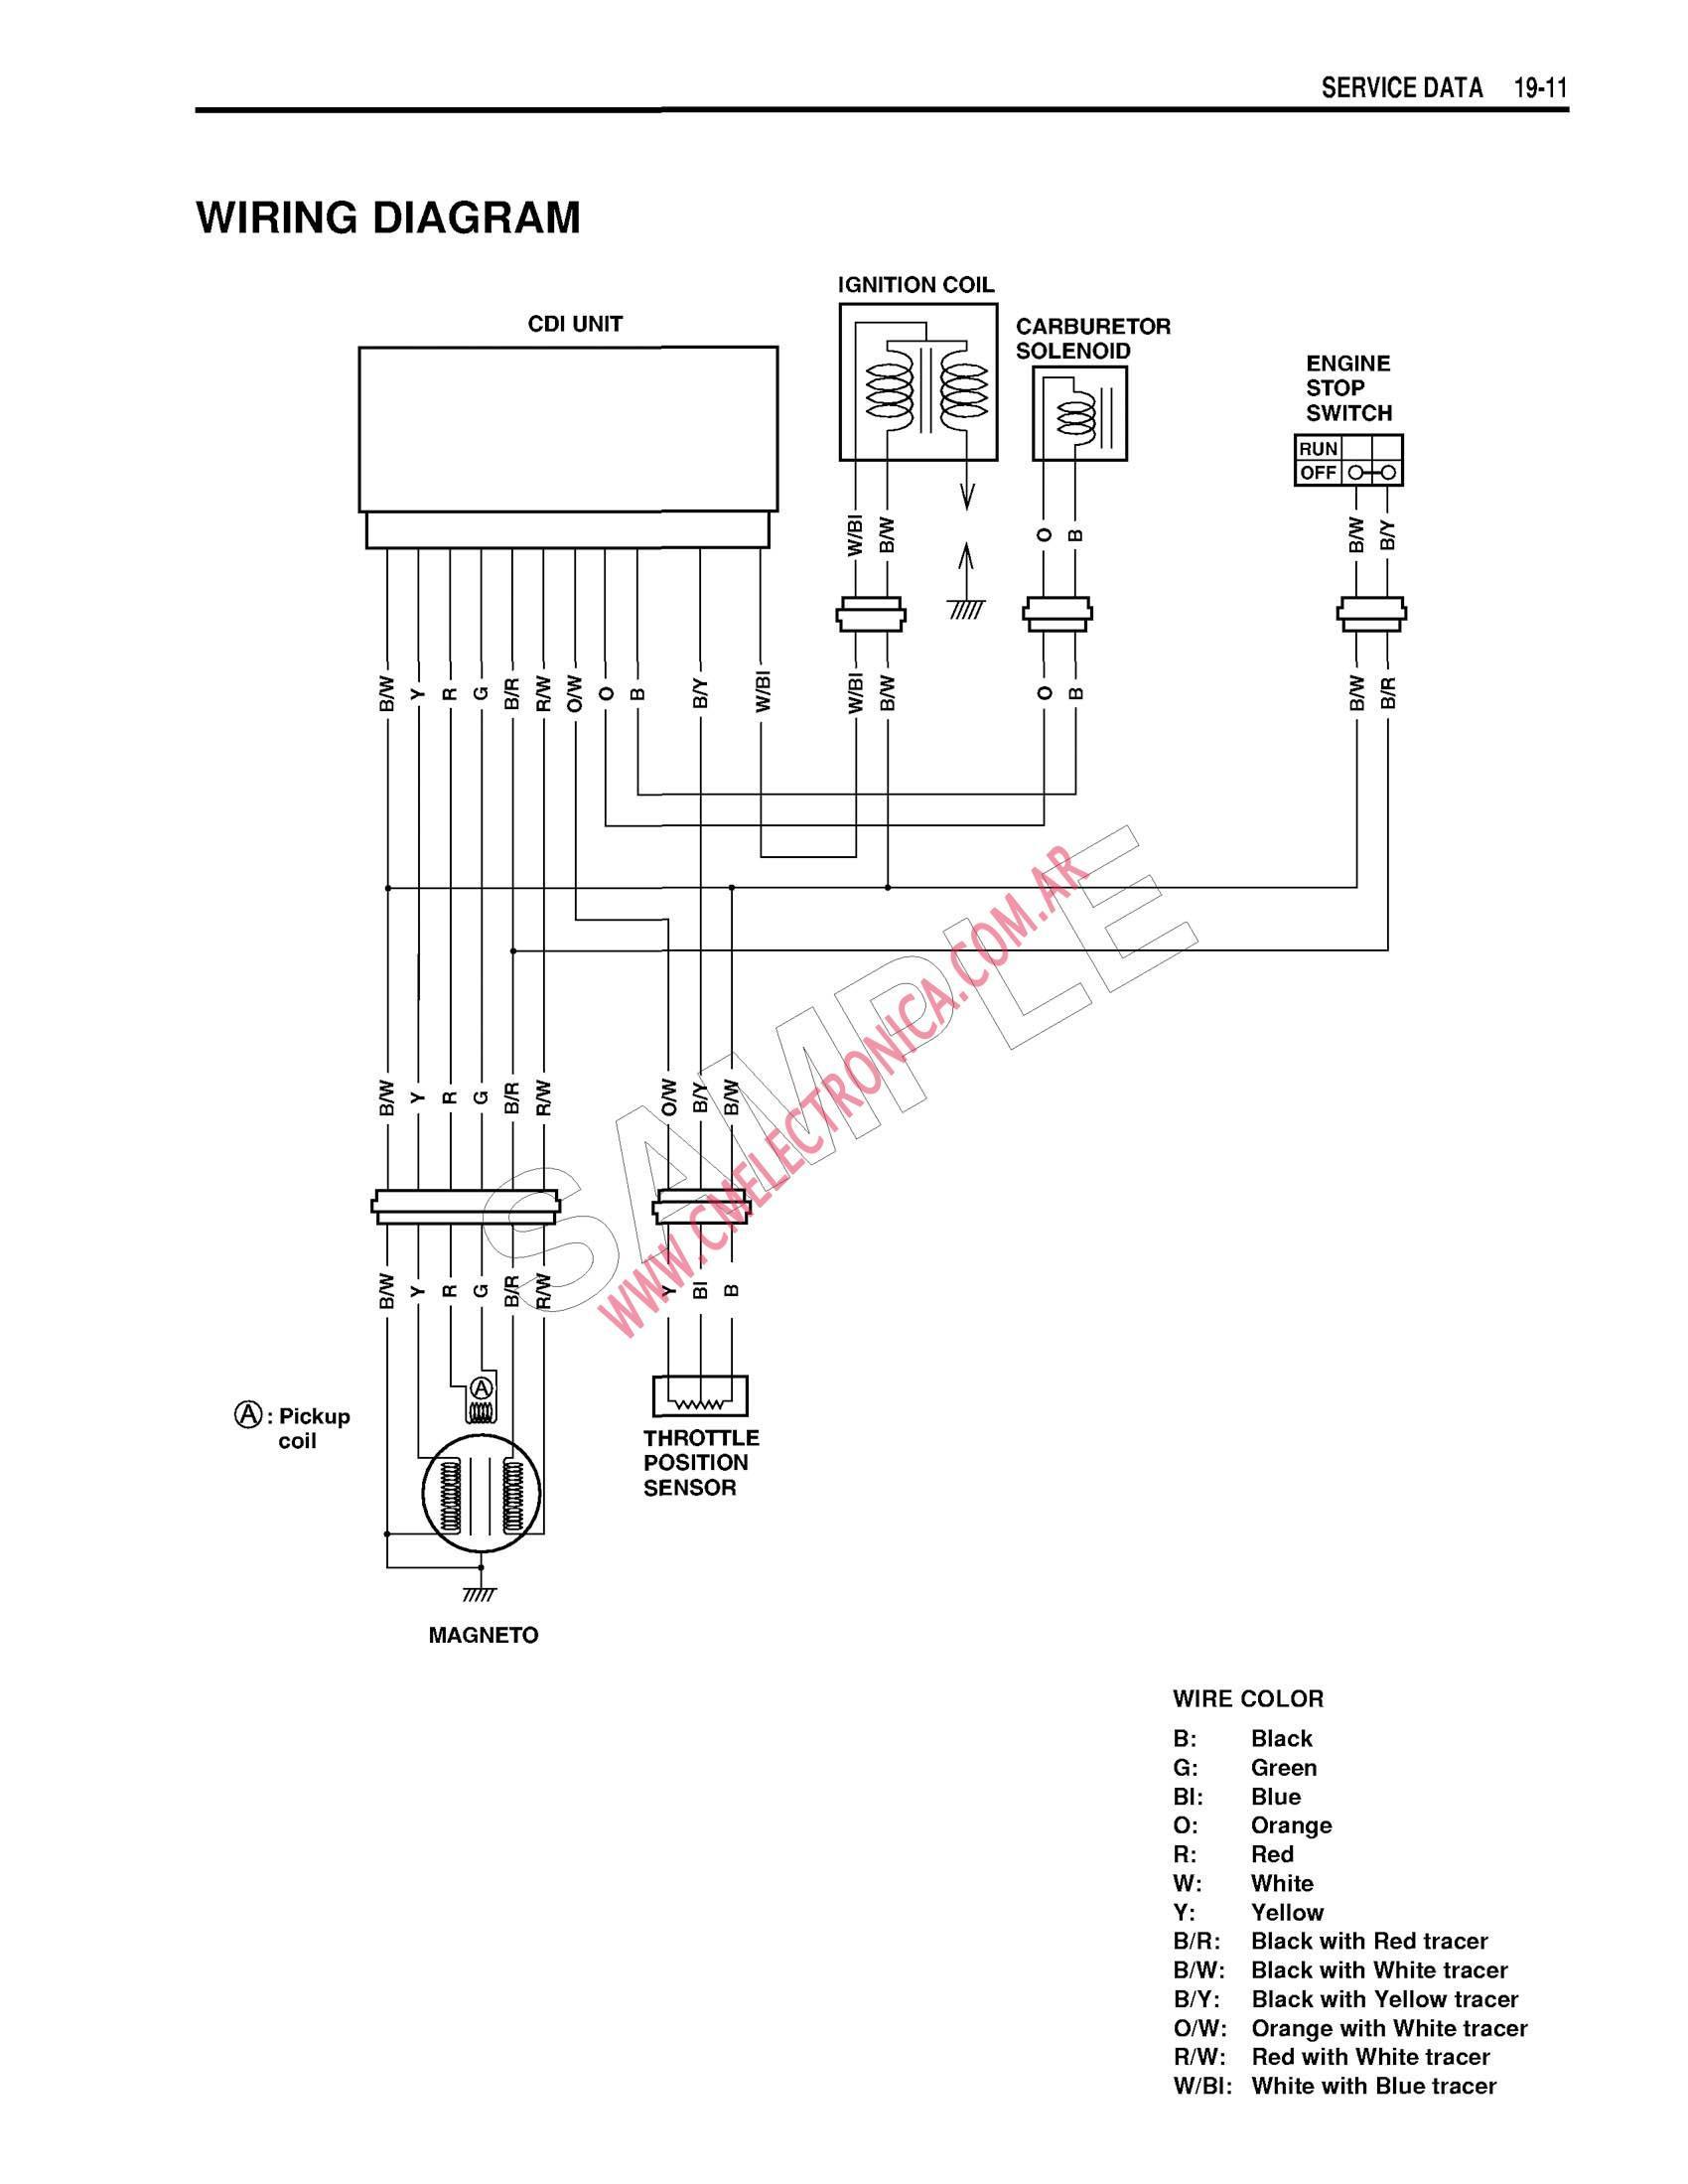 1997 Rm 250 Wiring Diagram